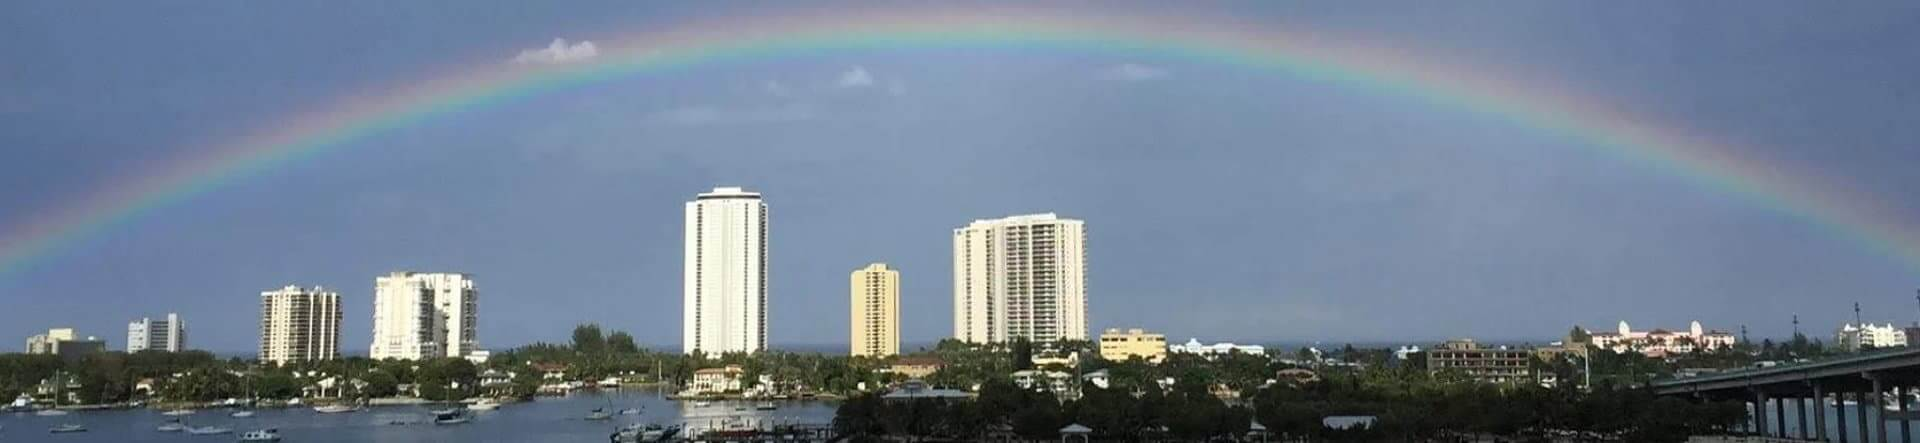 rainbow on a horizon concept